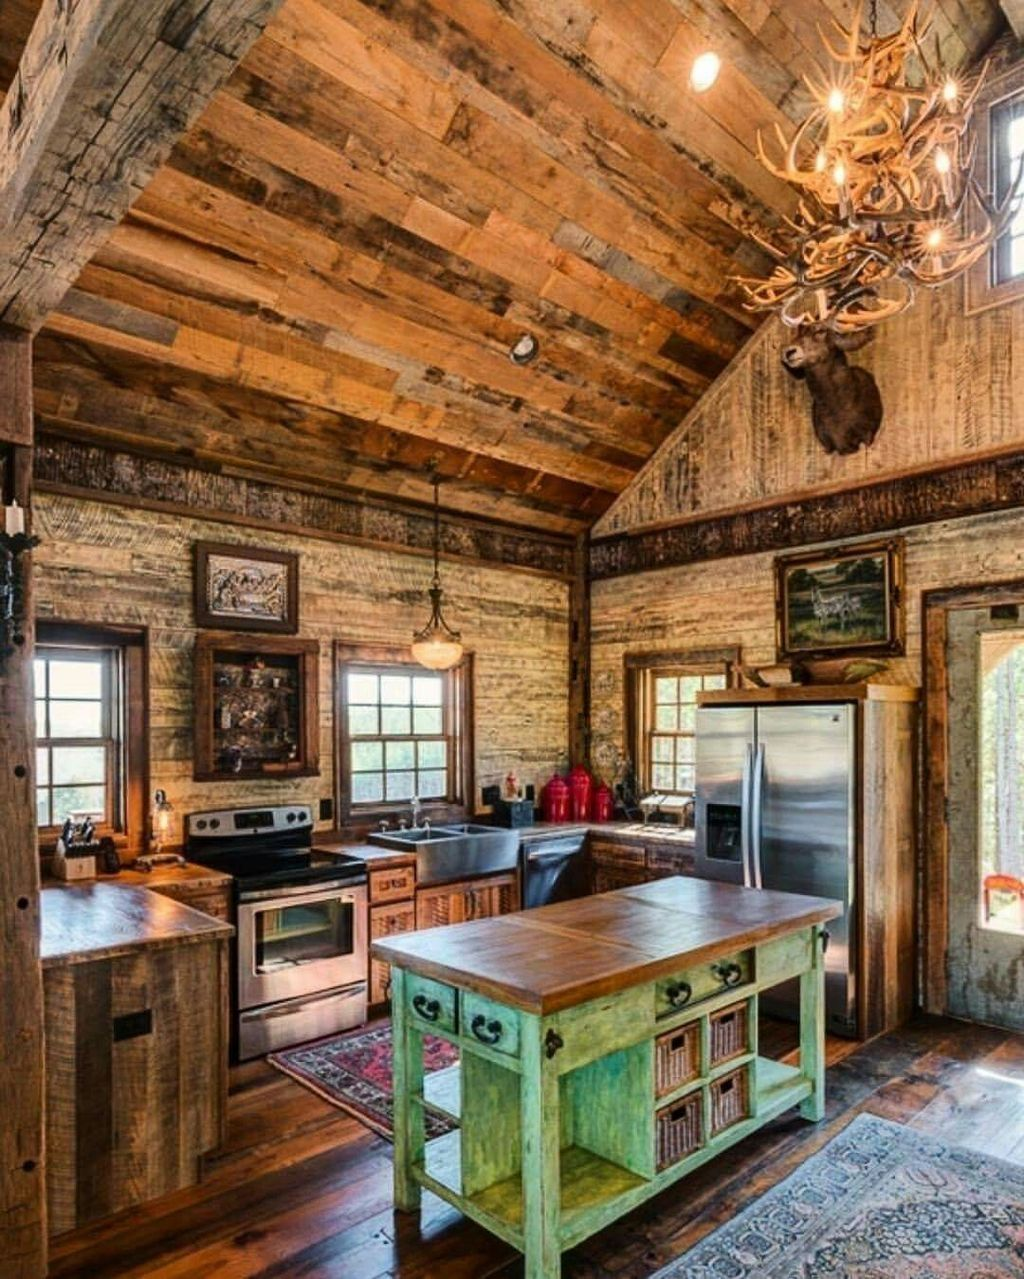 Awesome 20 Genius Ideas Use Wood Nature Decor Home More At Https Trendecora Com 2018 06 22 20 Genius Idea Rustic Cabin Kitchens Rustic House Cabin Kitchens